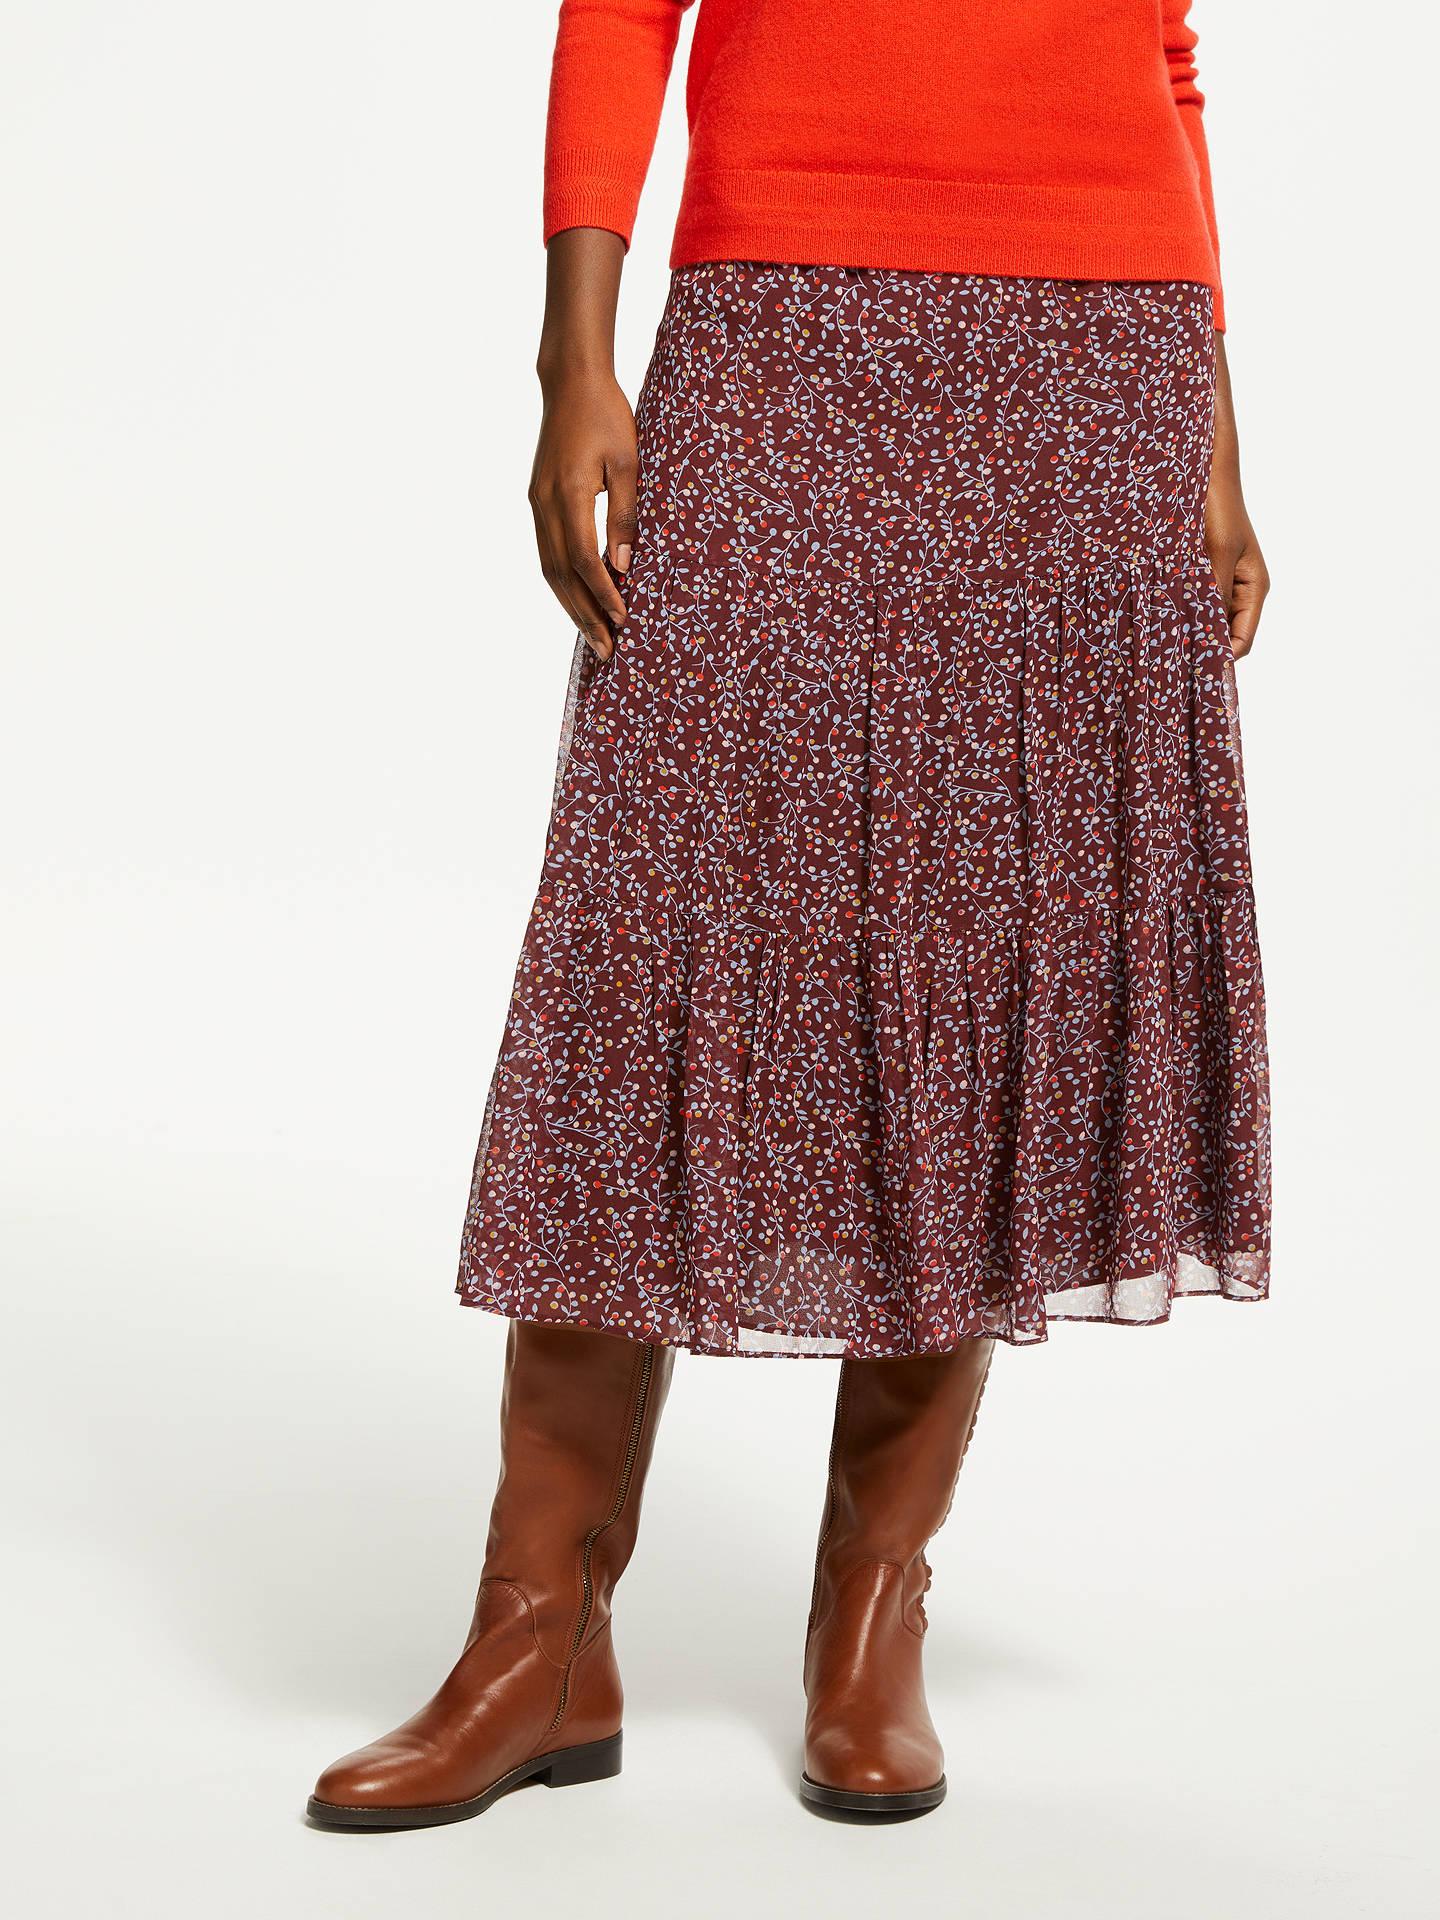 35f0c3094f Buy Boden Frome Floral Print Skirt, Dark Burgundy, 18 Online at  johnlewis.com ...